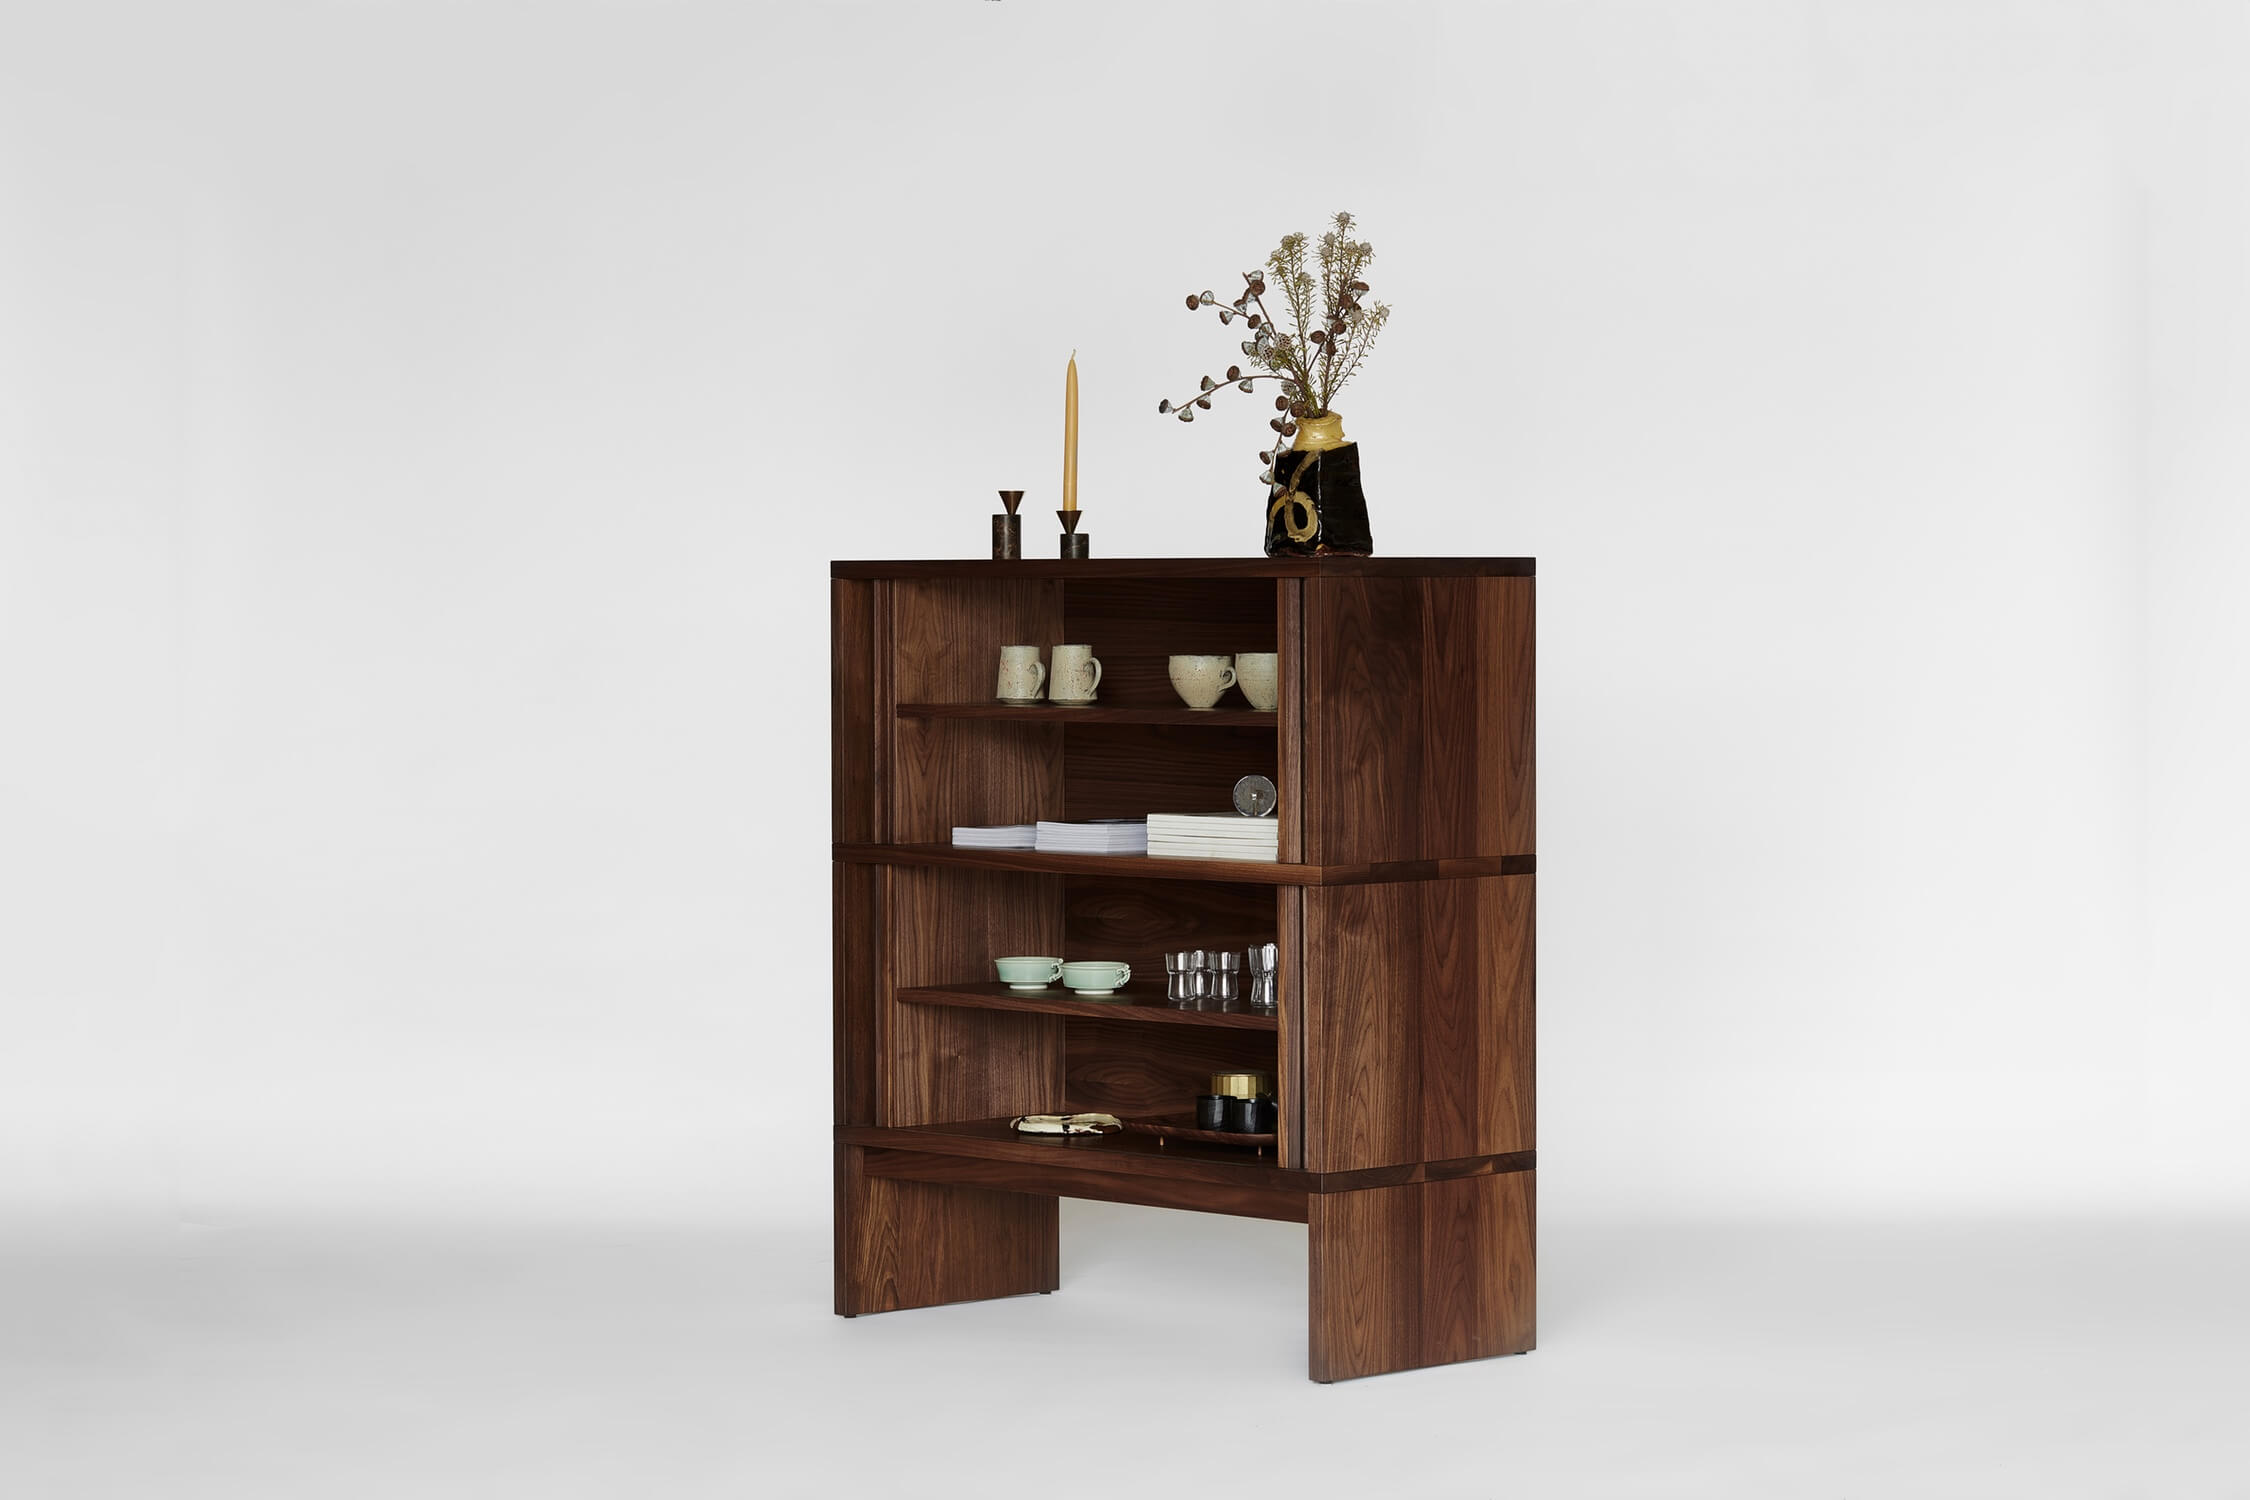 Azure Thom Fougere Mjolk Furniture Collection 6